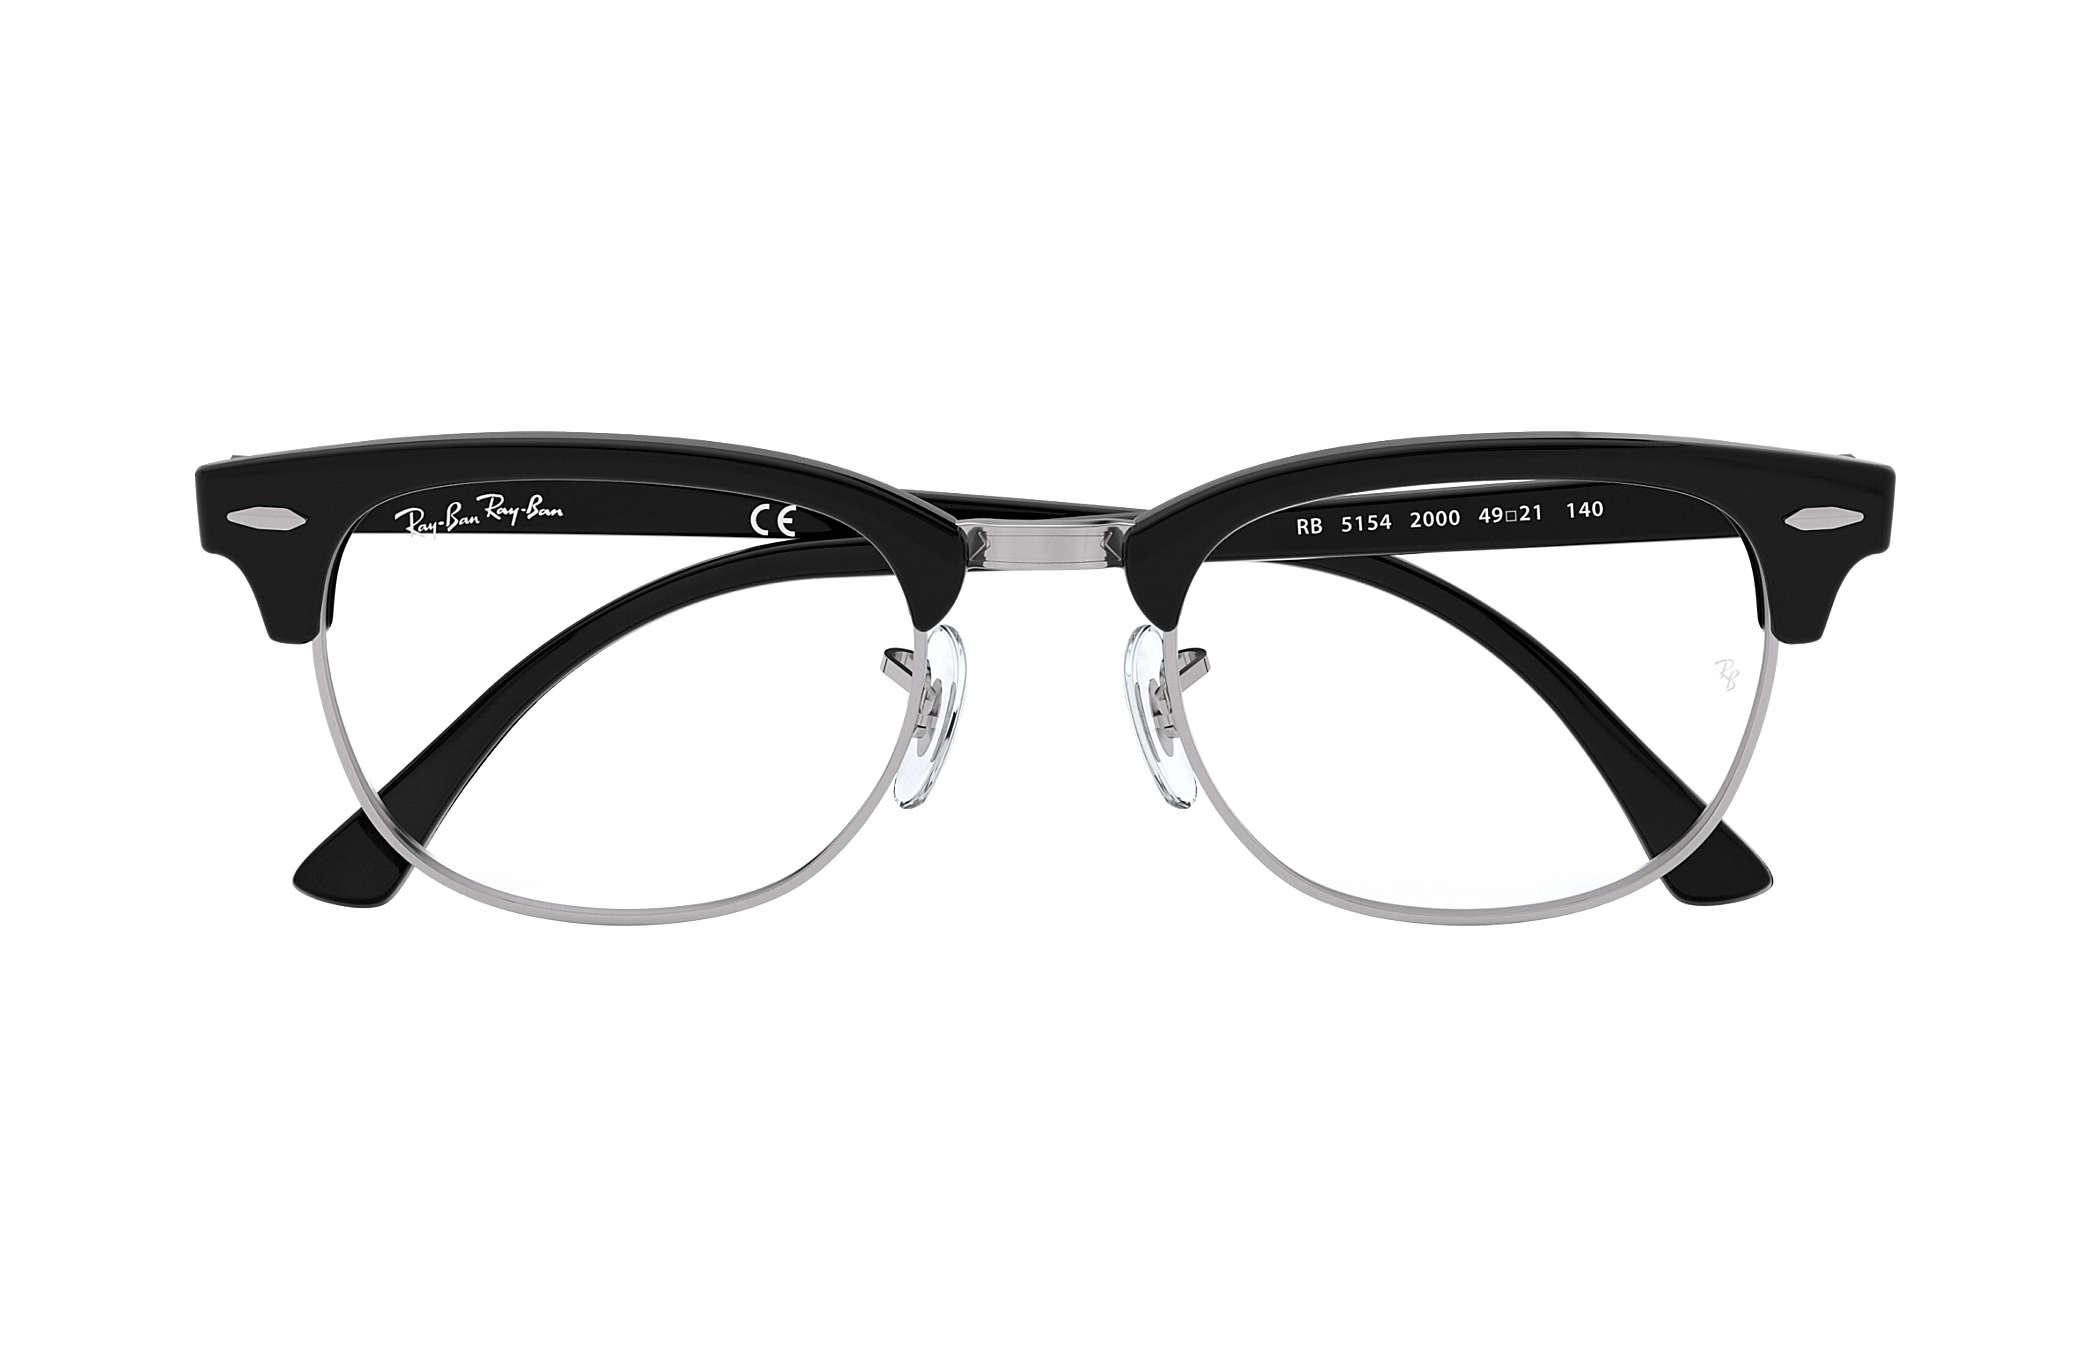 club master glasses  PDP_META_DATA_EYEGLASSES??? RB5154 Black Acetate